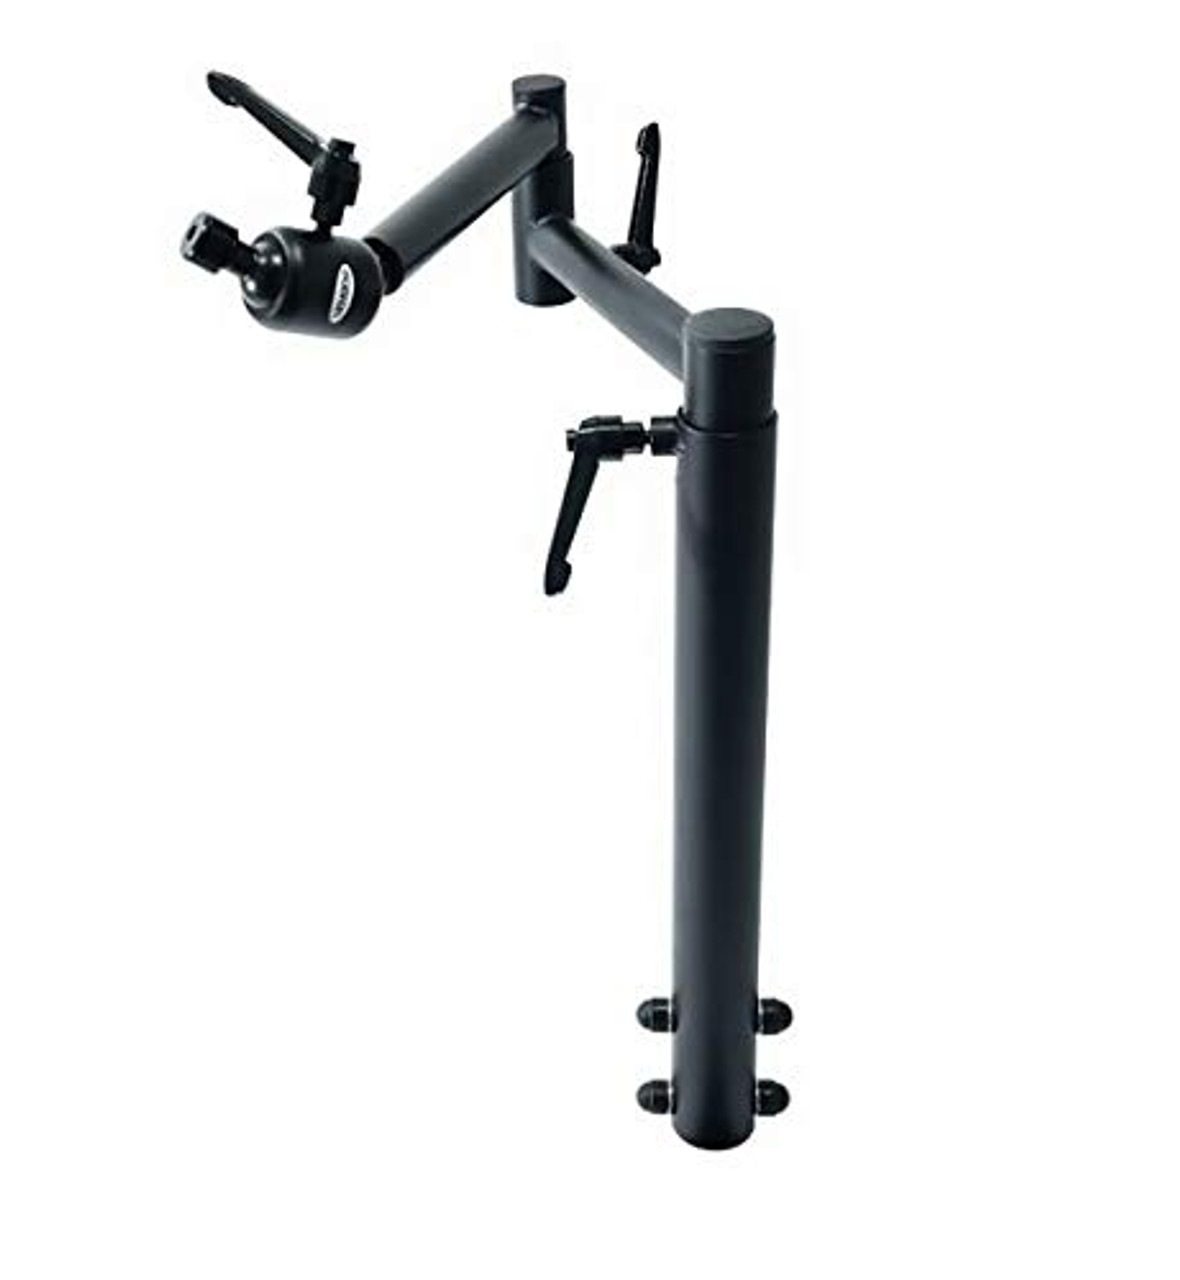 Zirkona Dual Articulating Arm w/Medium Joiner and VESA 75/100 Adapter Plate - Replaces PN 17241 (7110-1246) | 0410XE7JU9G